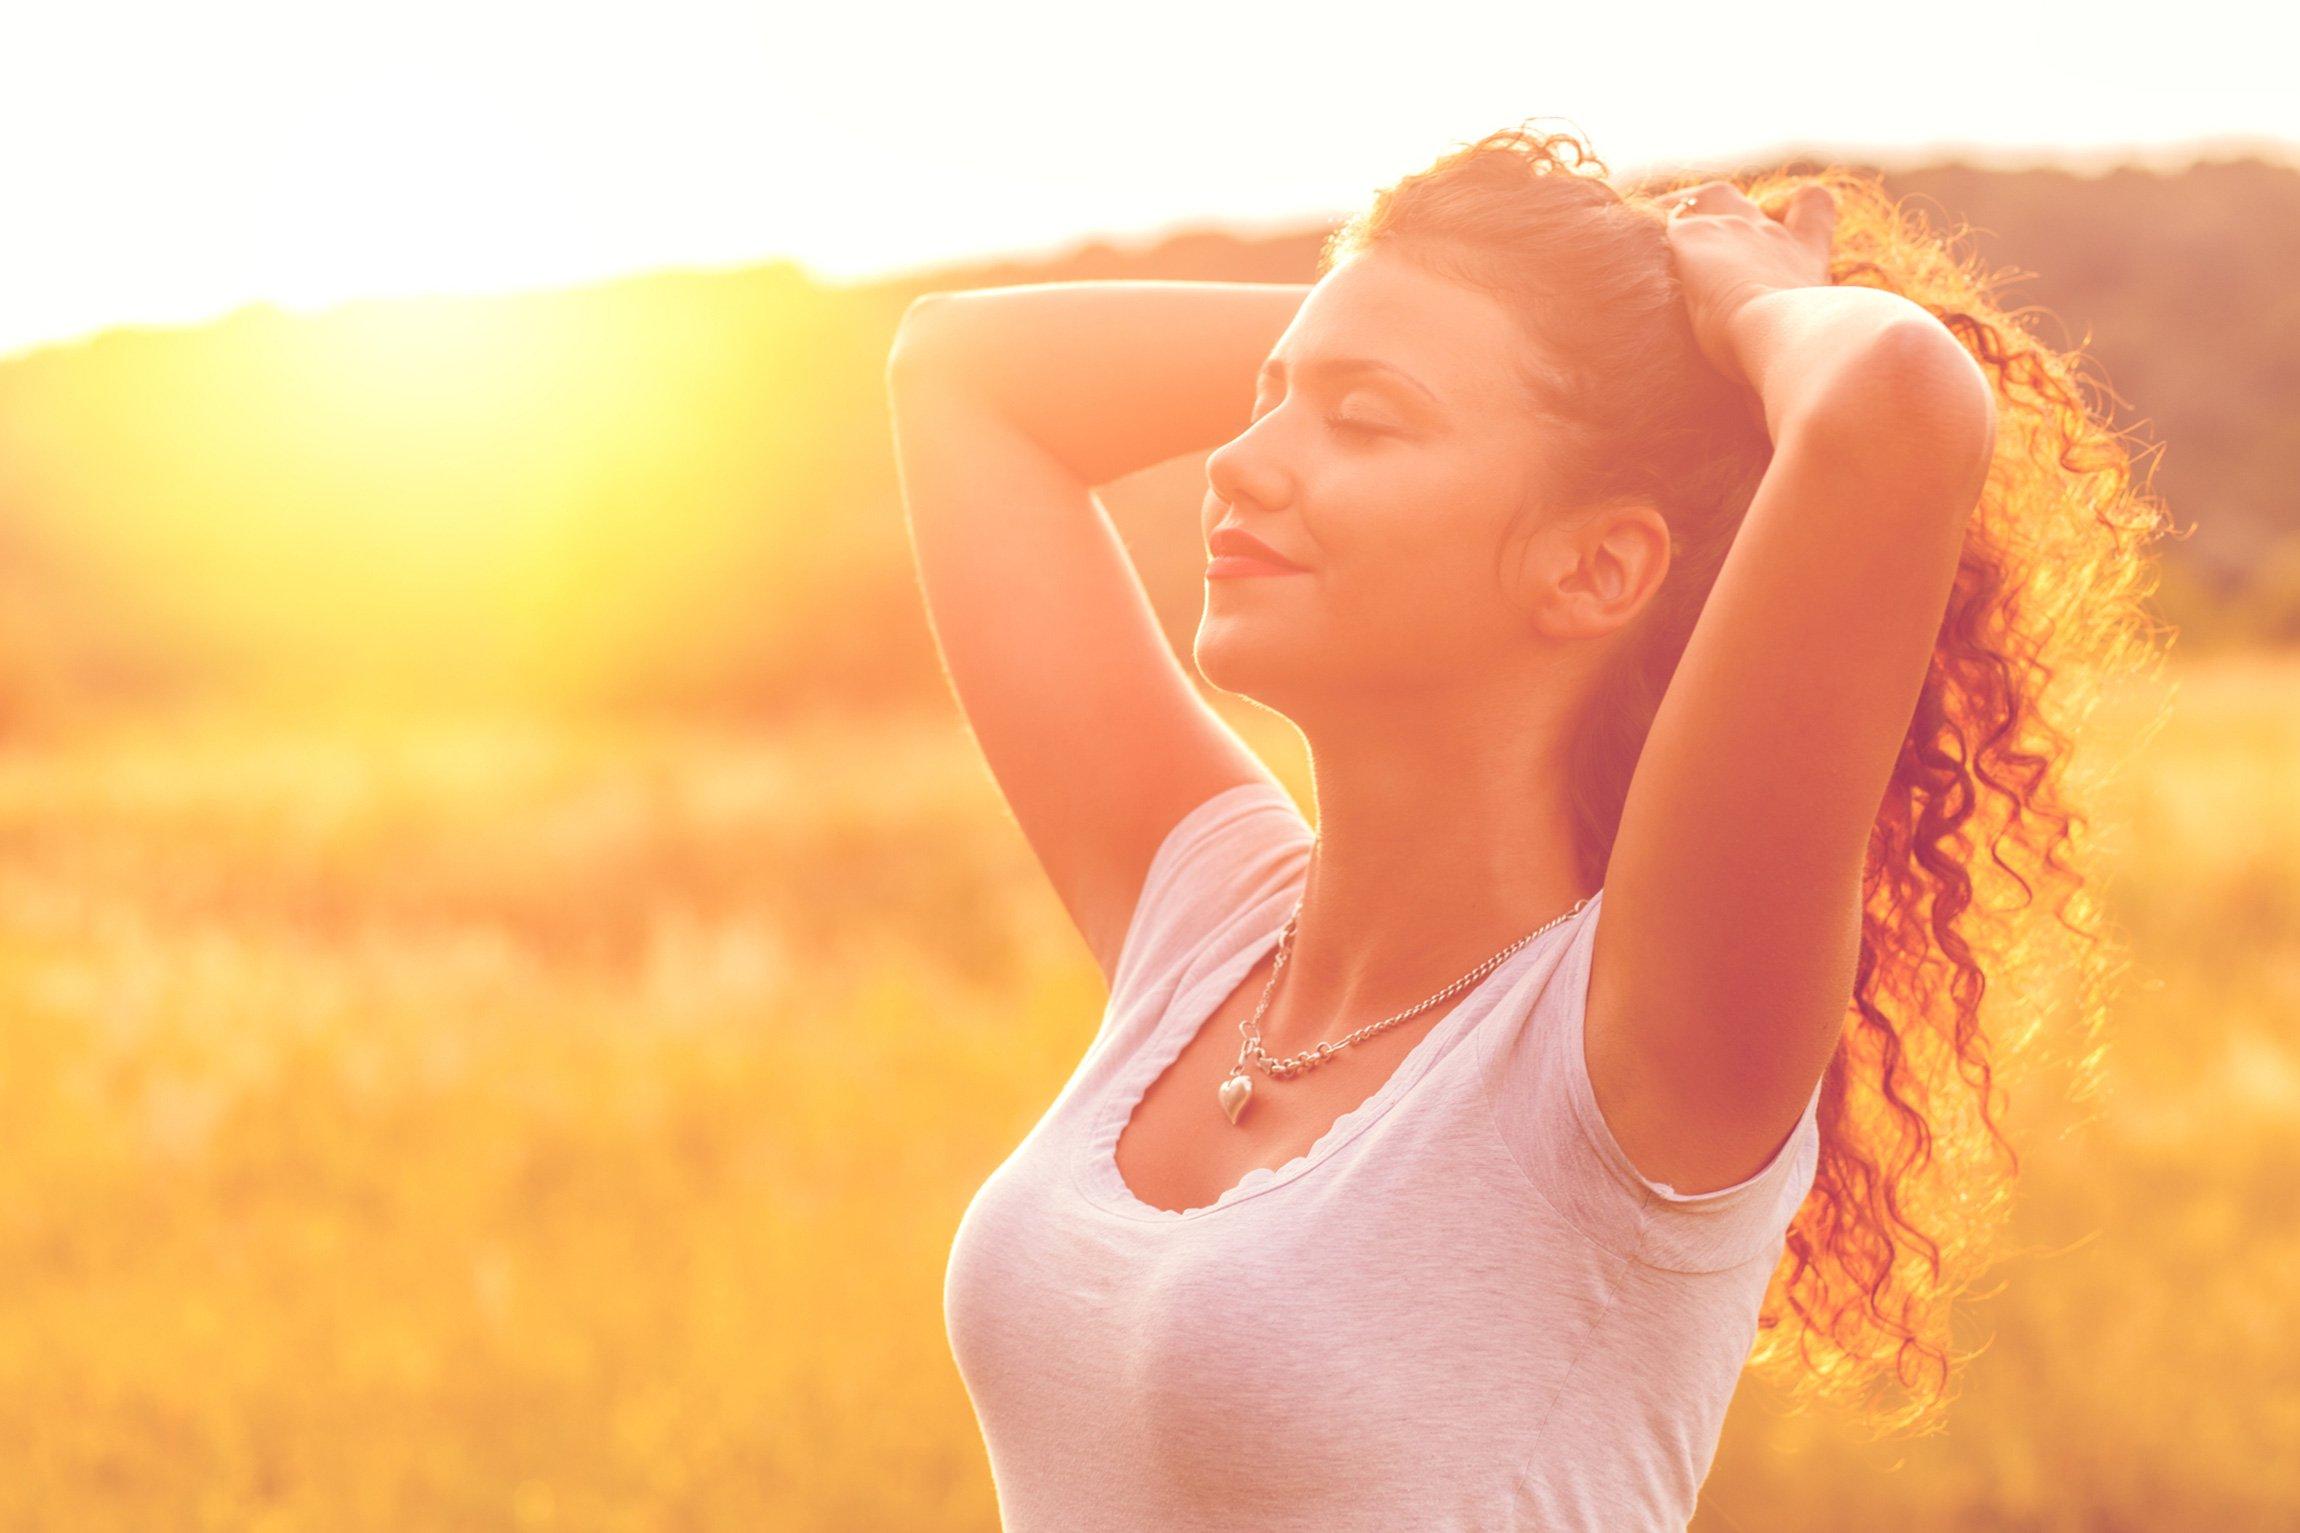 A woman enjoying the sun on her face